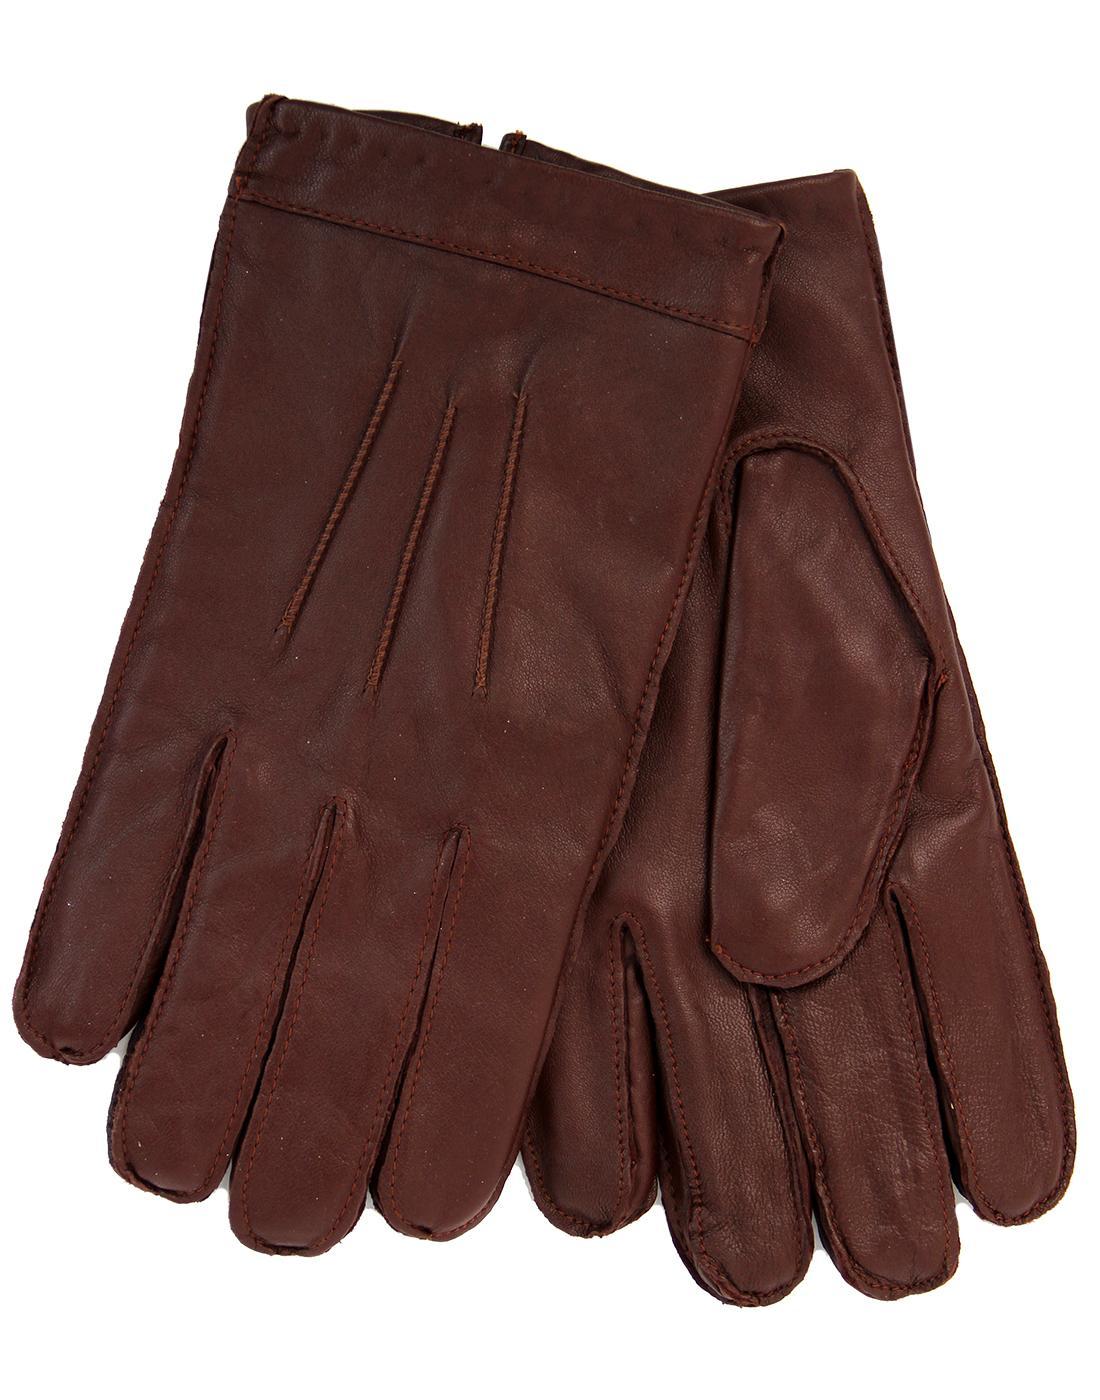 GIBSON LONDON Men's Retro Cognac Leather Gloves